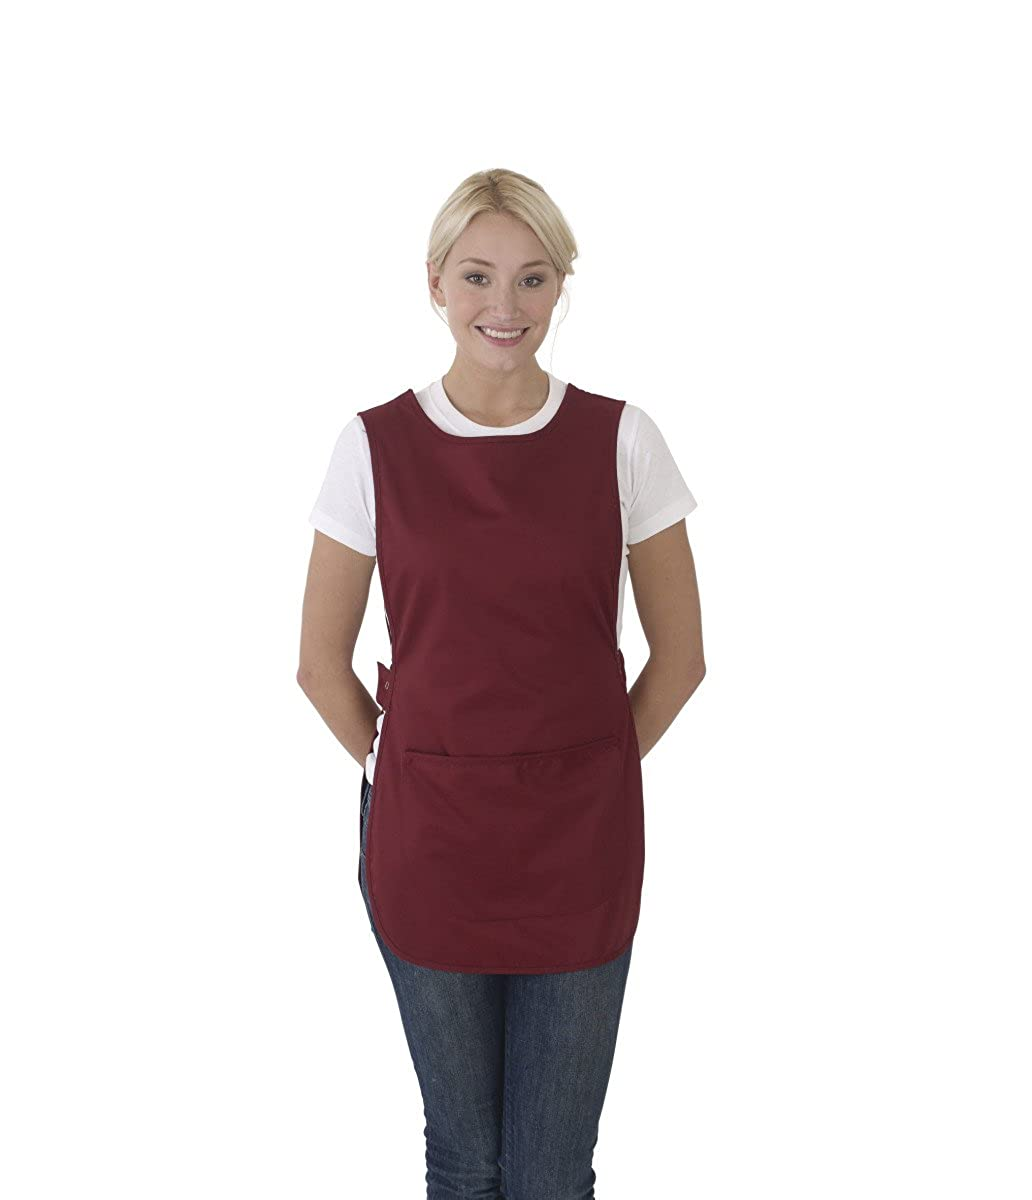 Dennys Hospitality Uniform Tabard Restaurant Sleeveless Catering Workwear Aprons